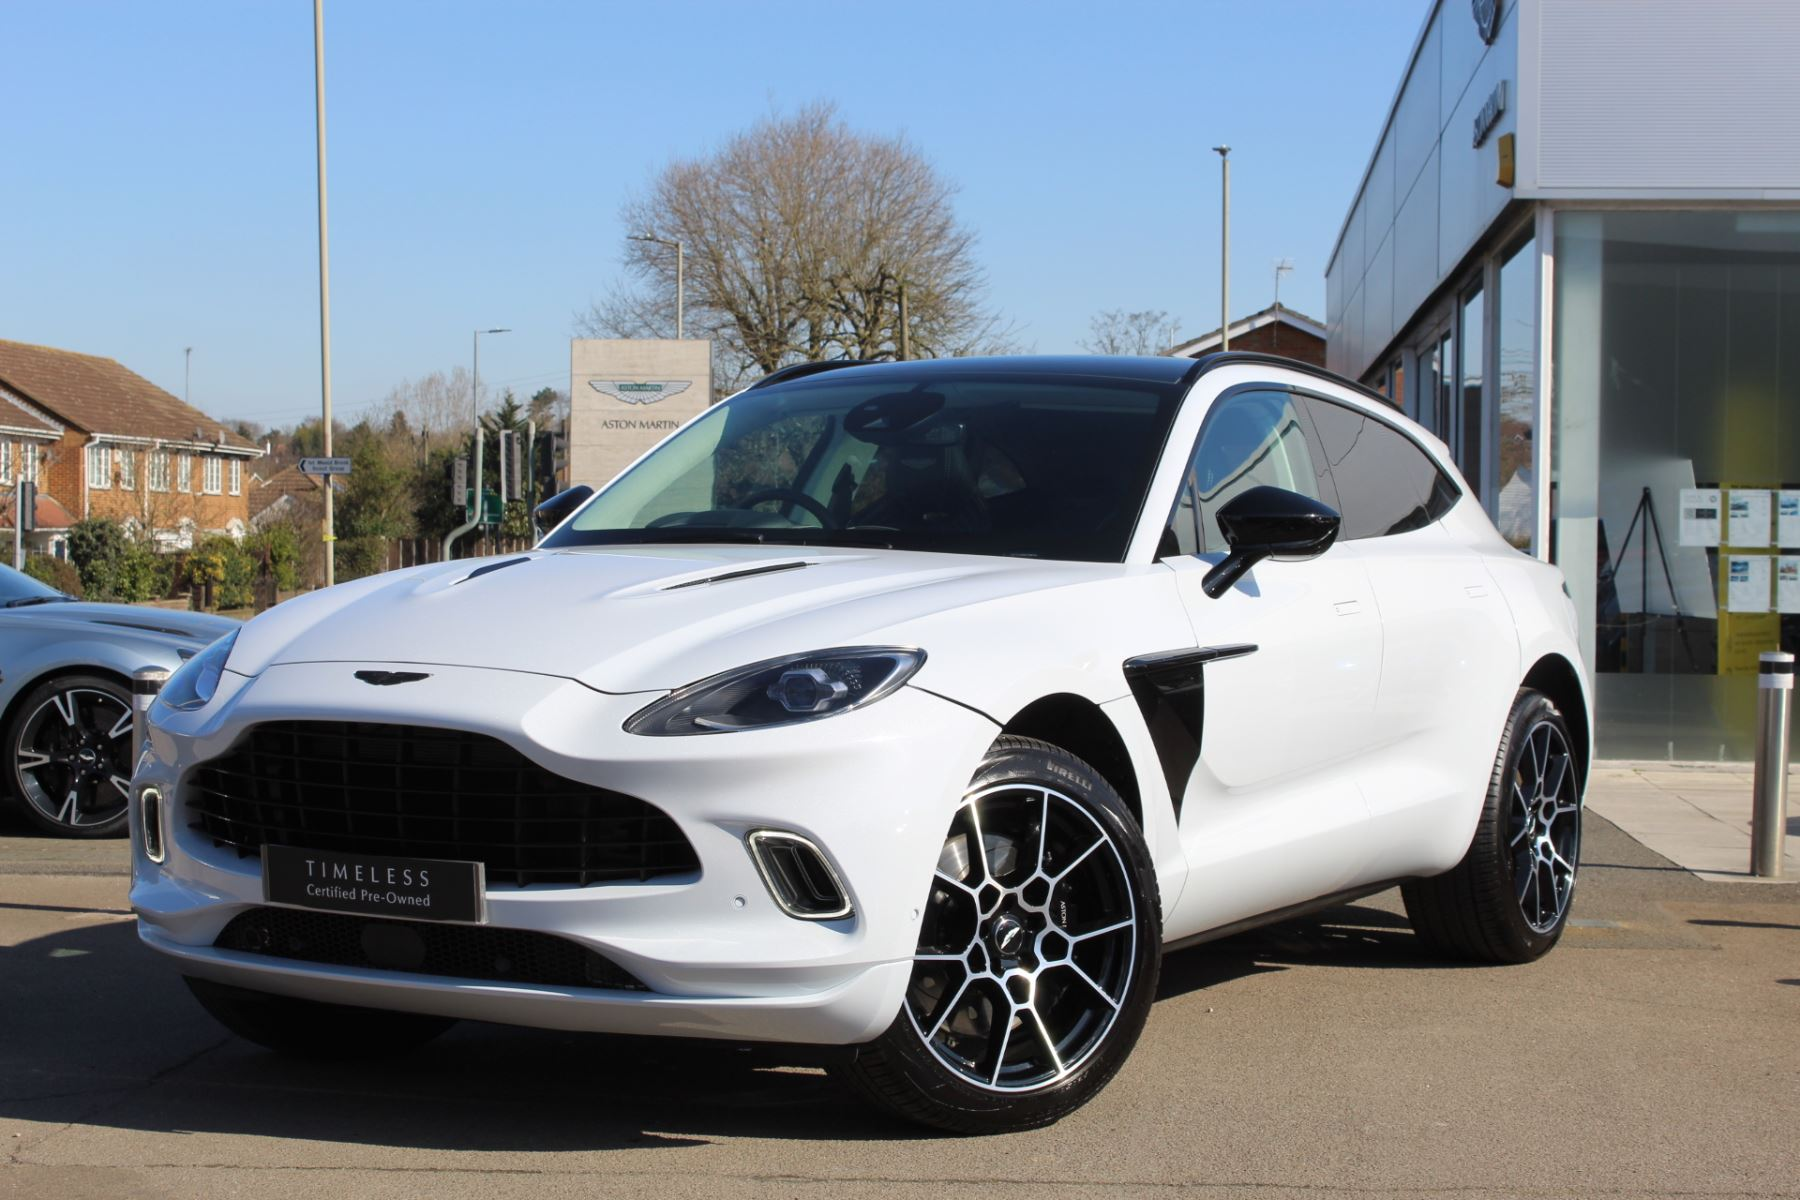 Aston Martin DBX V8 Twin Turbo Massive Spec Low mileage 4.0 Automatic 4 door 4x4